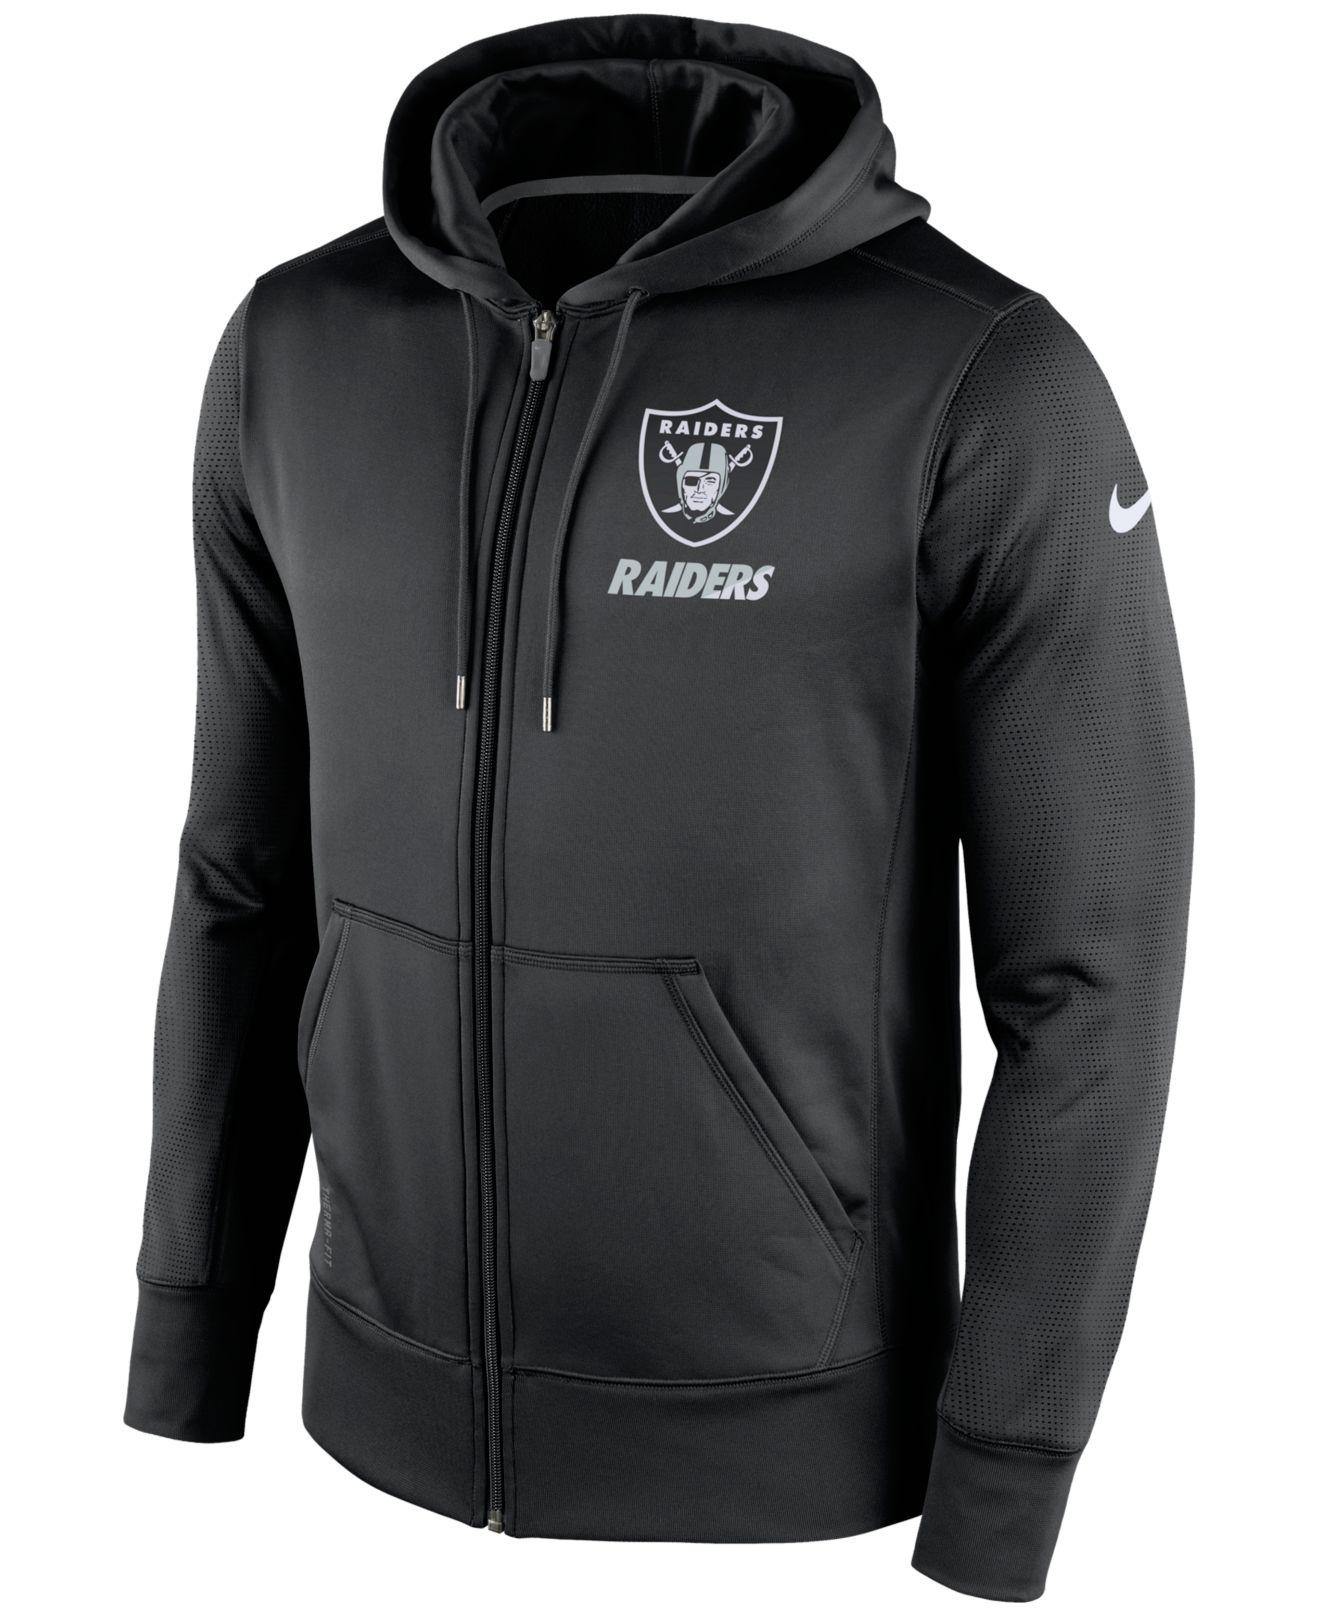 9a5087398dfba1 Lyst - Nike Men s Oakland Raiders Sideline Ko Fleece Full-zip Hoodie ...